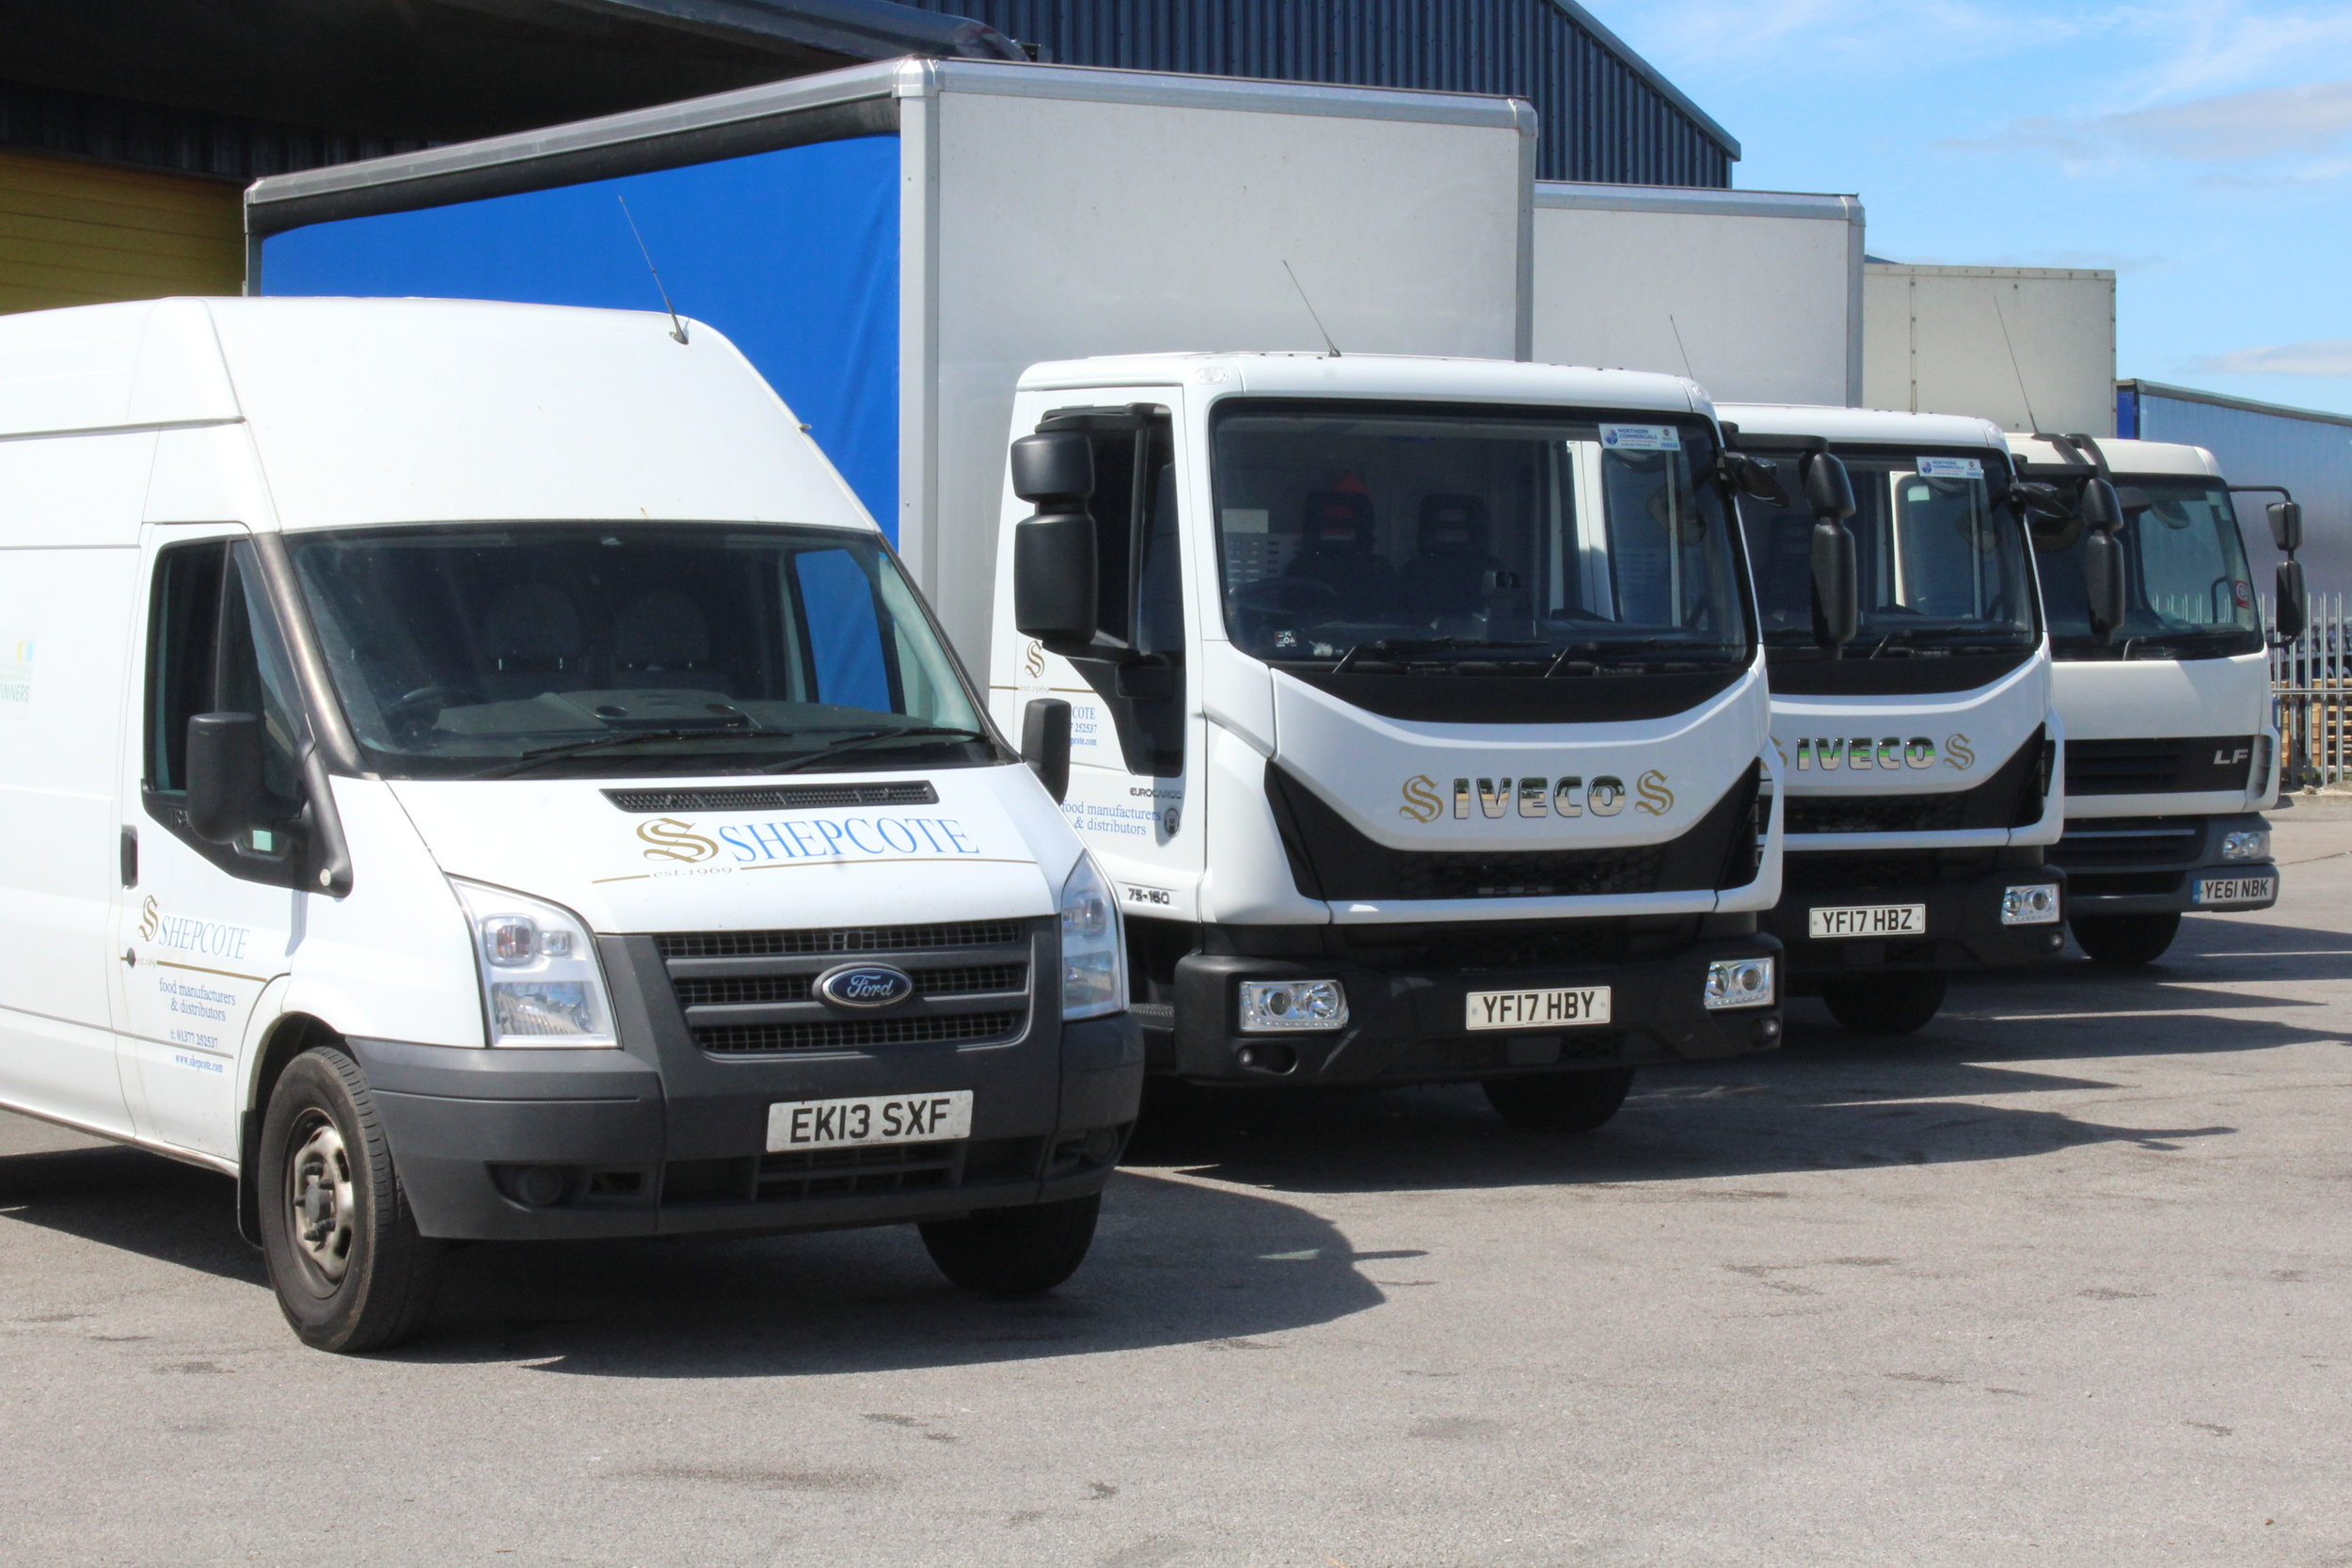 Shepcote Delivery Fleet